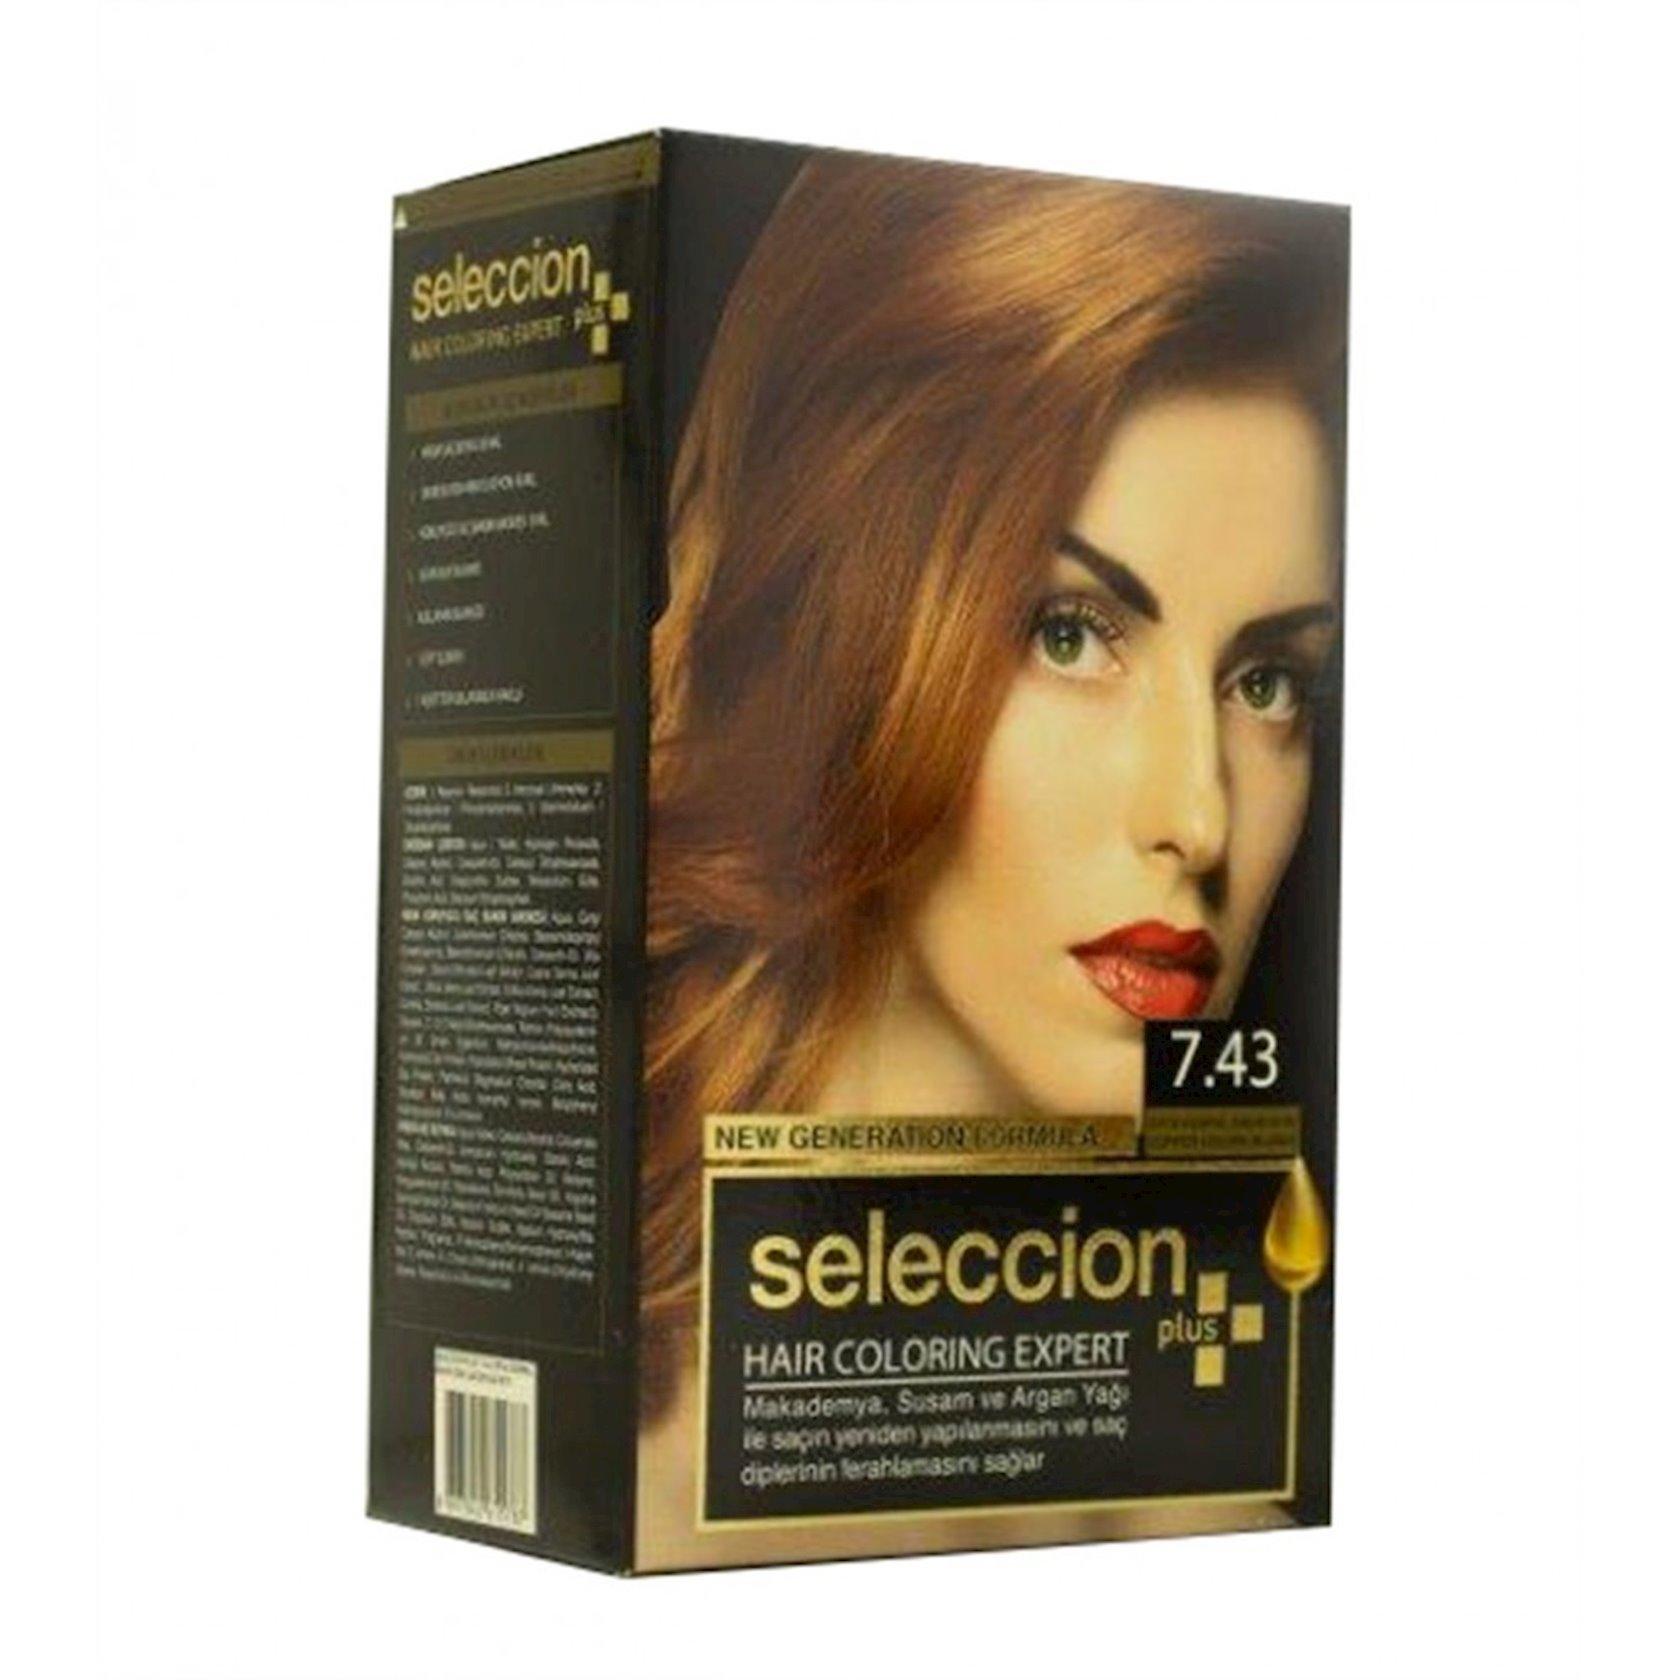 Saç boyası Seleccion Plus Set Plus Set Dye 7.43 Mis-qızılı sarışın 110 ml